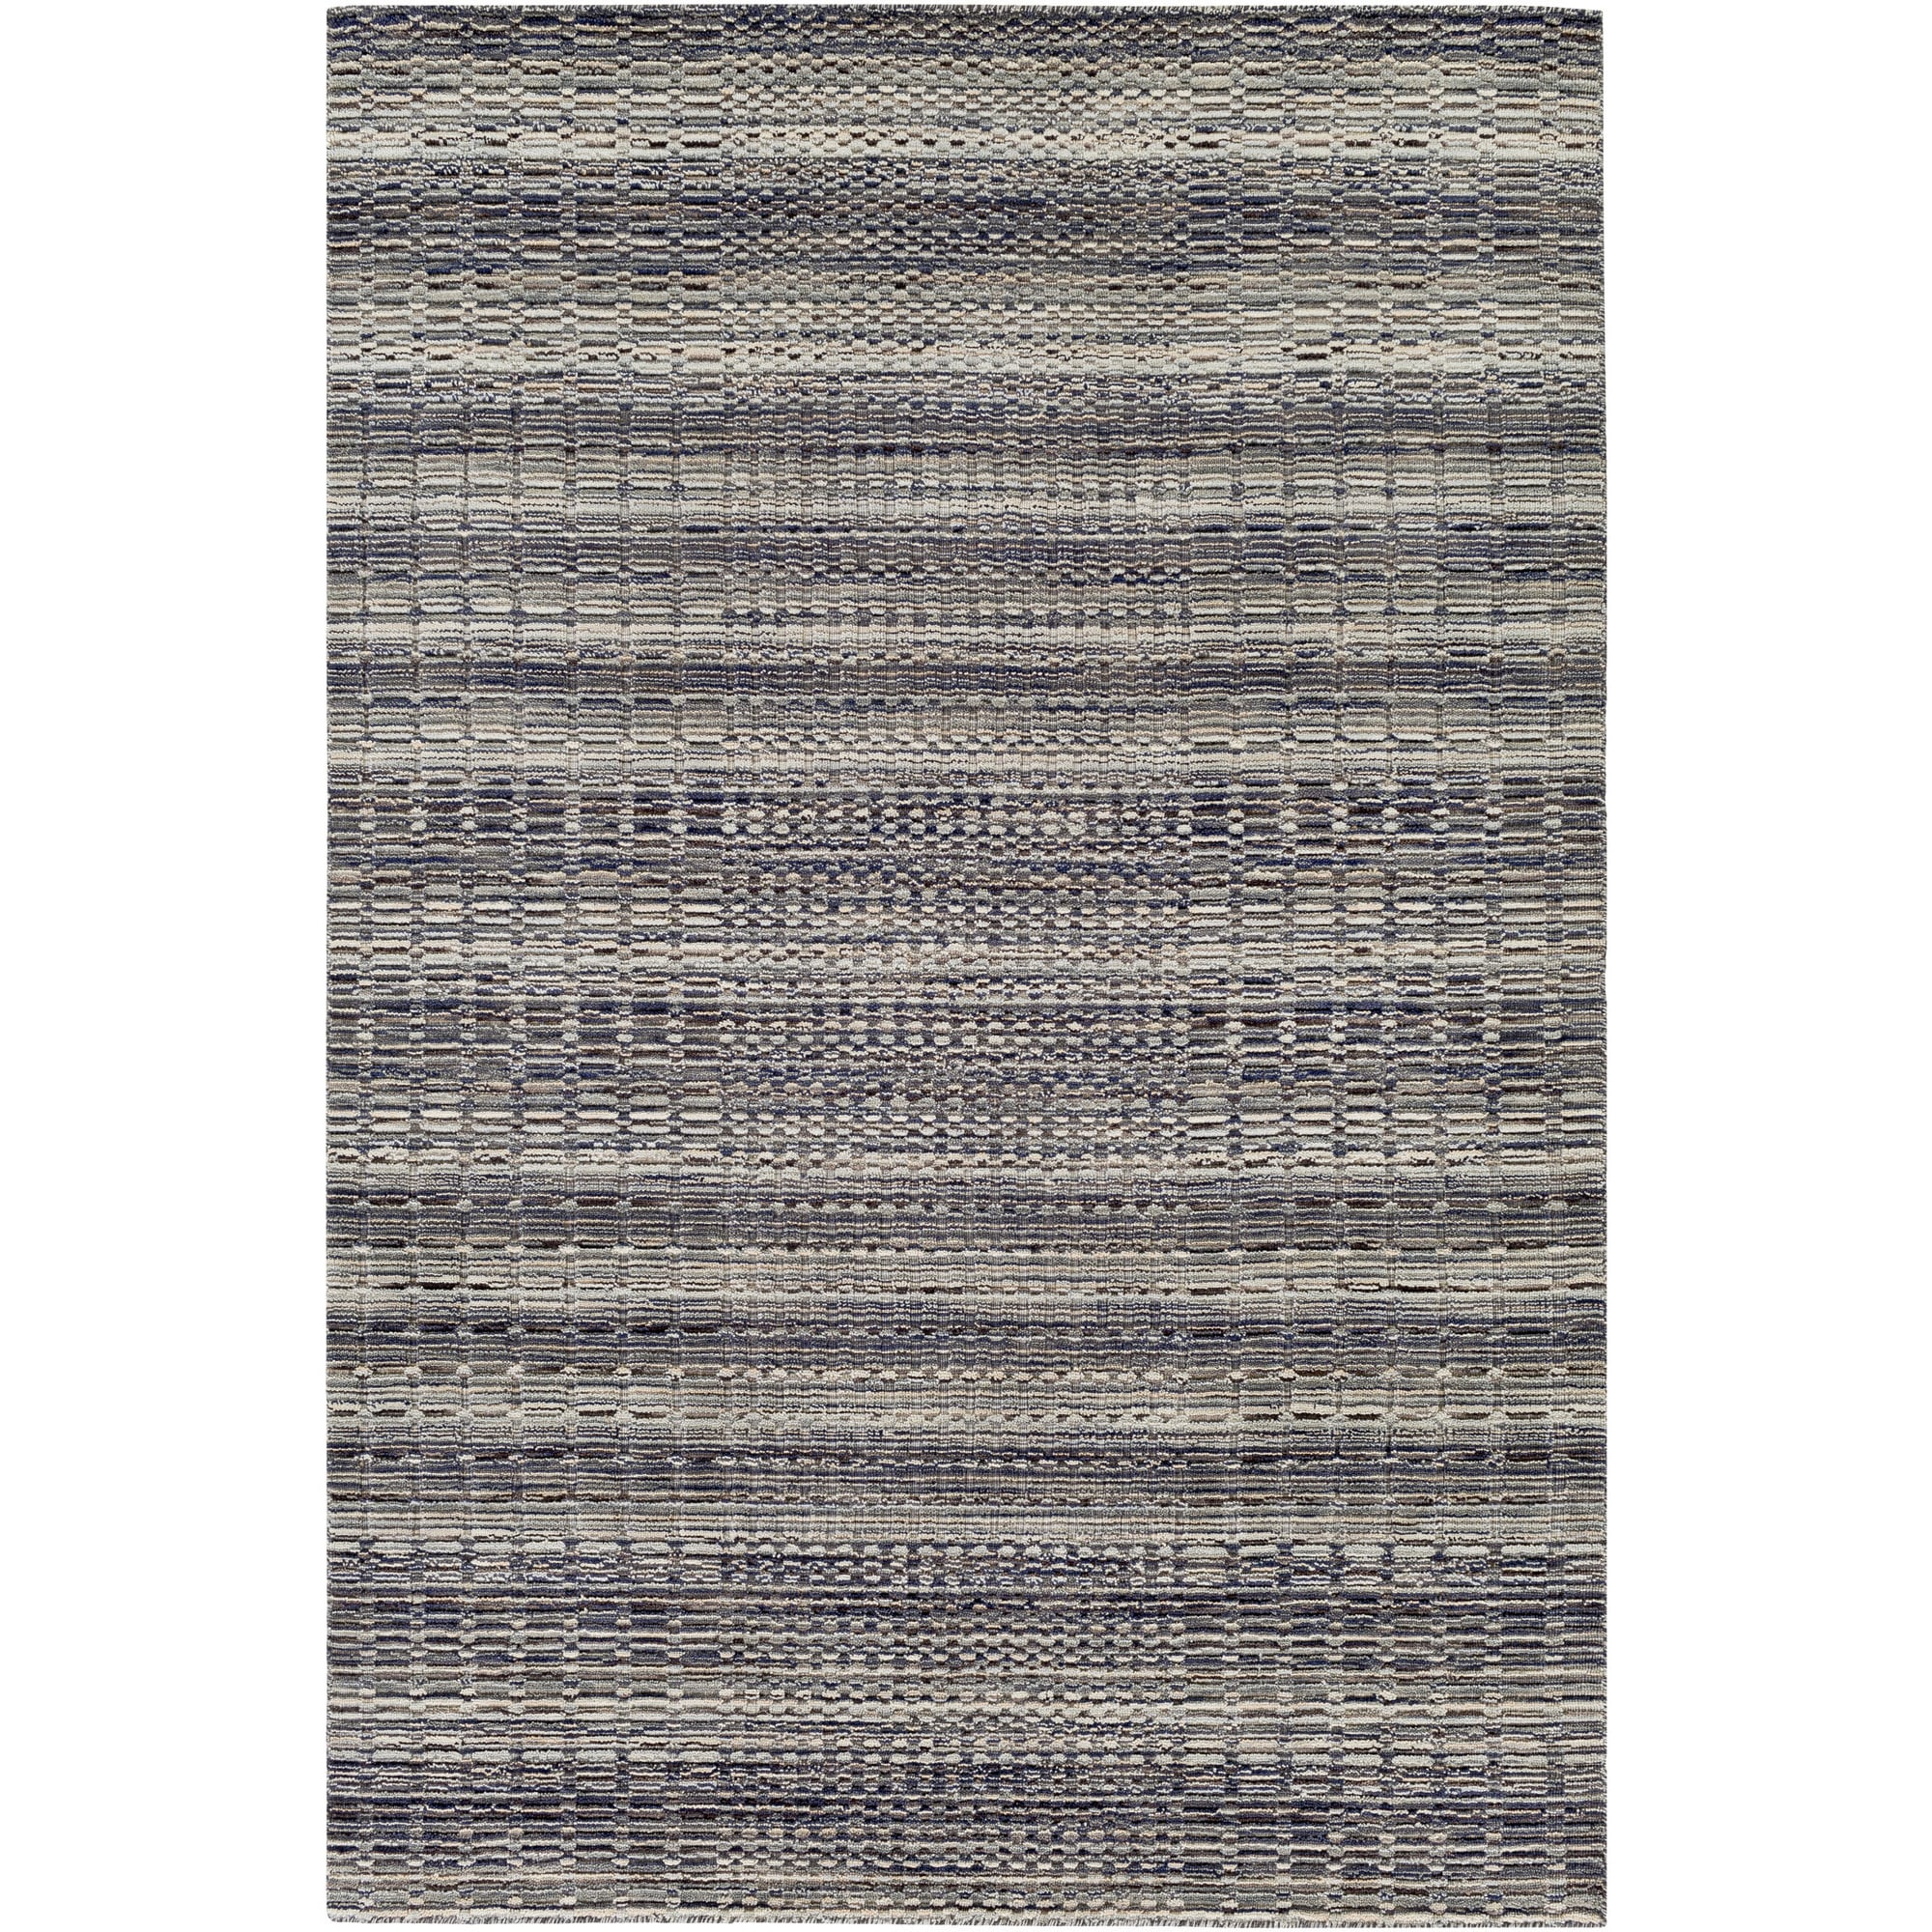 "Handmade Ankita Wool Rug (5' x 7'6"") (Khaki (Green)), Siz..."